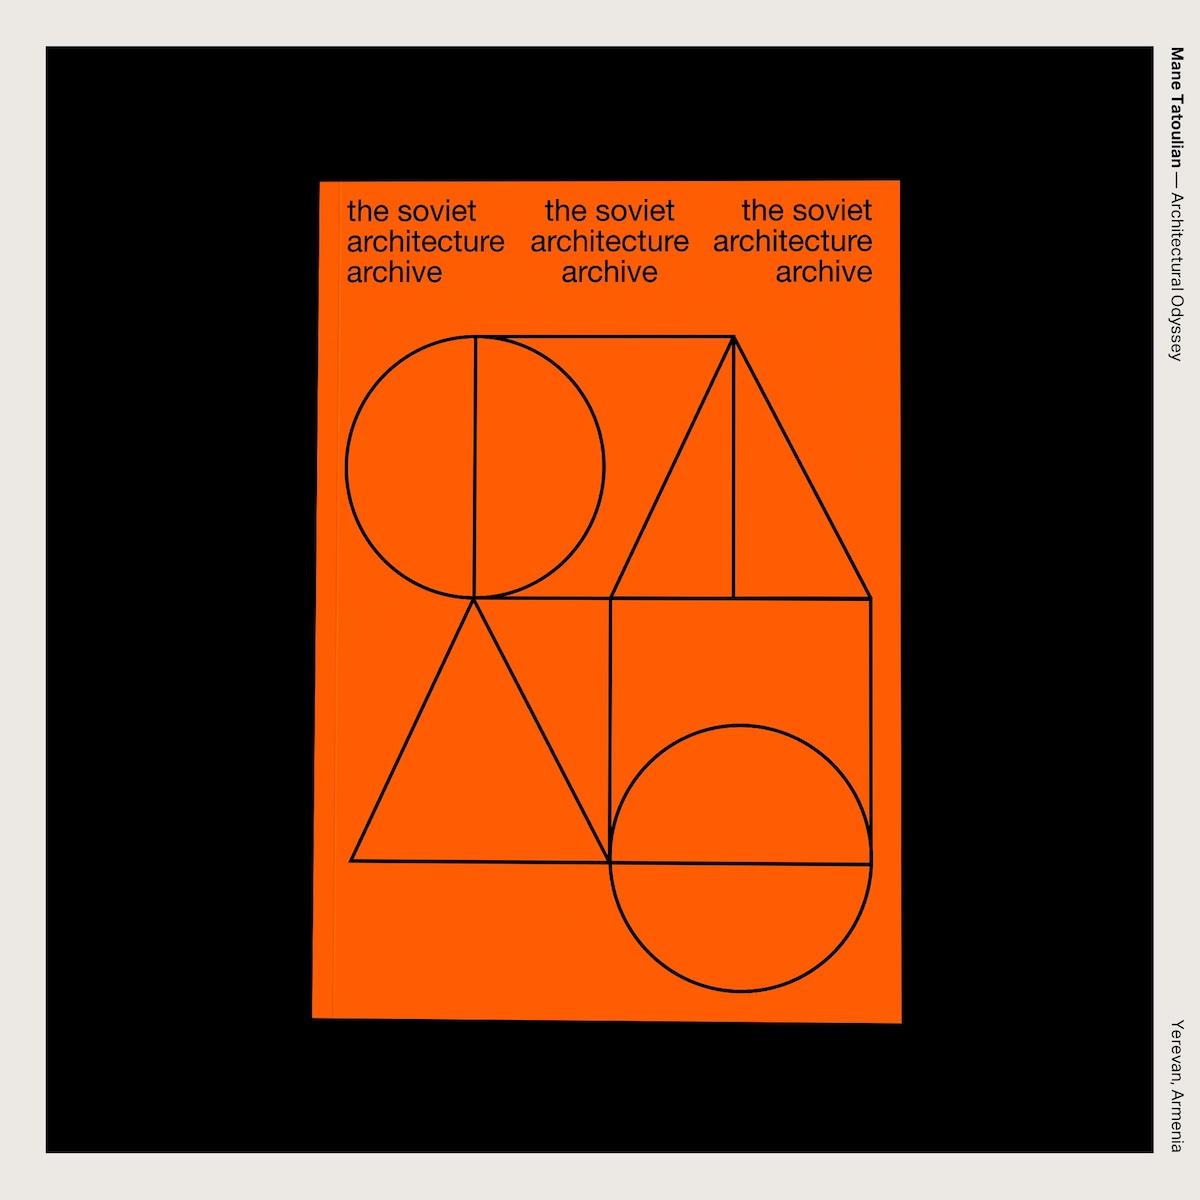 Mane Tatoulian — Architectural Odyssey